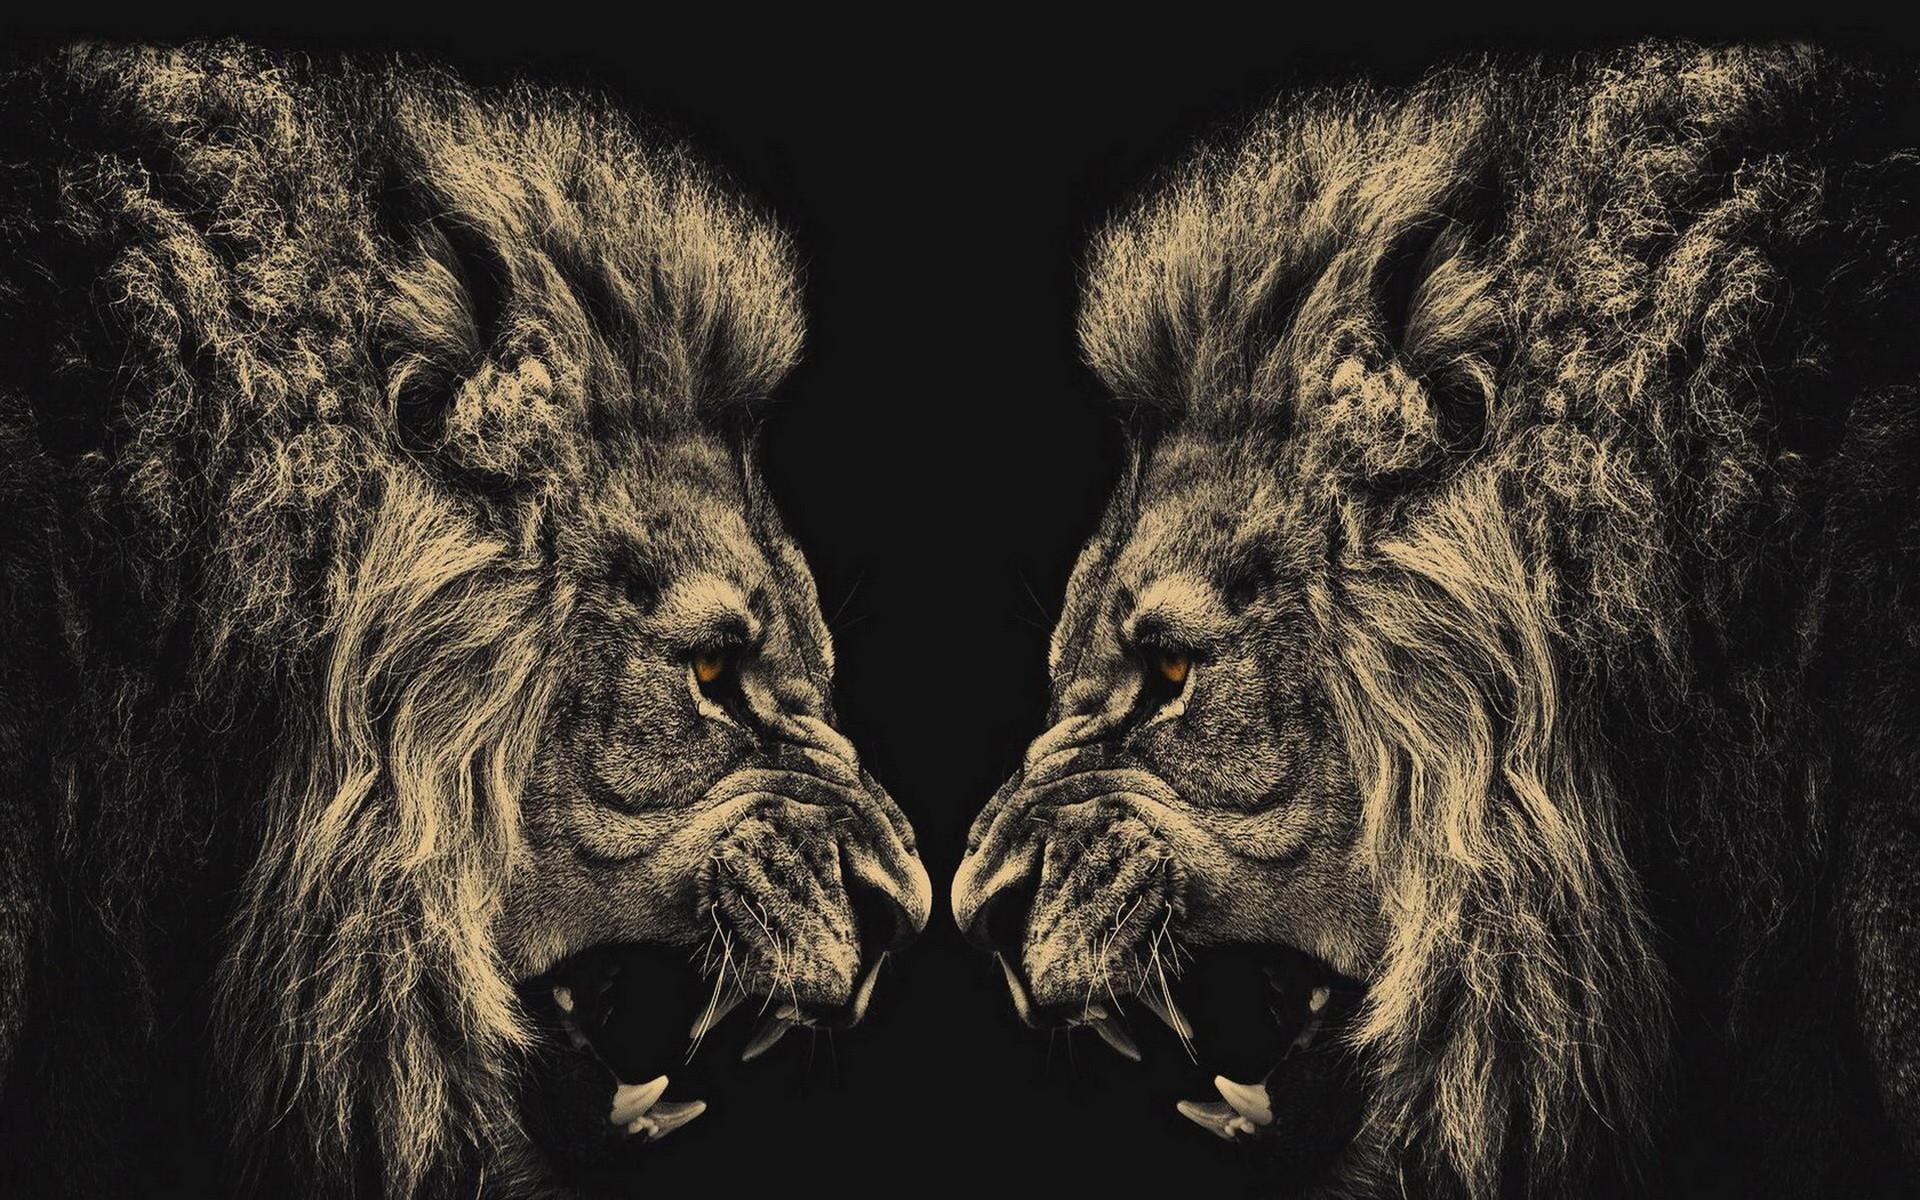 0 Angry Lion HD Wallpaper BigHDWalls Angry Lion Hd Wallpaper